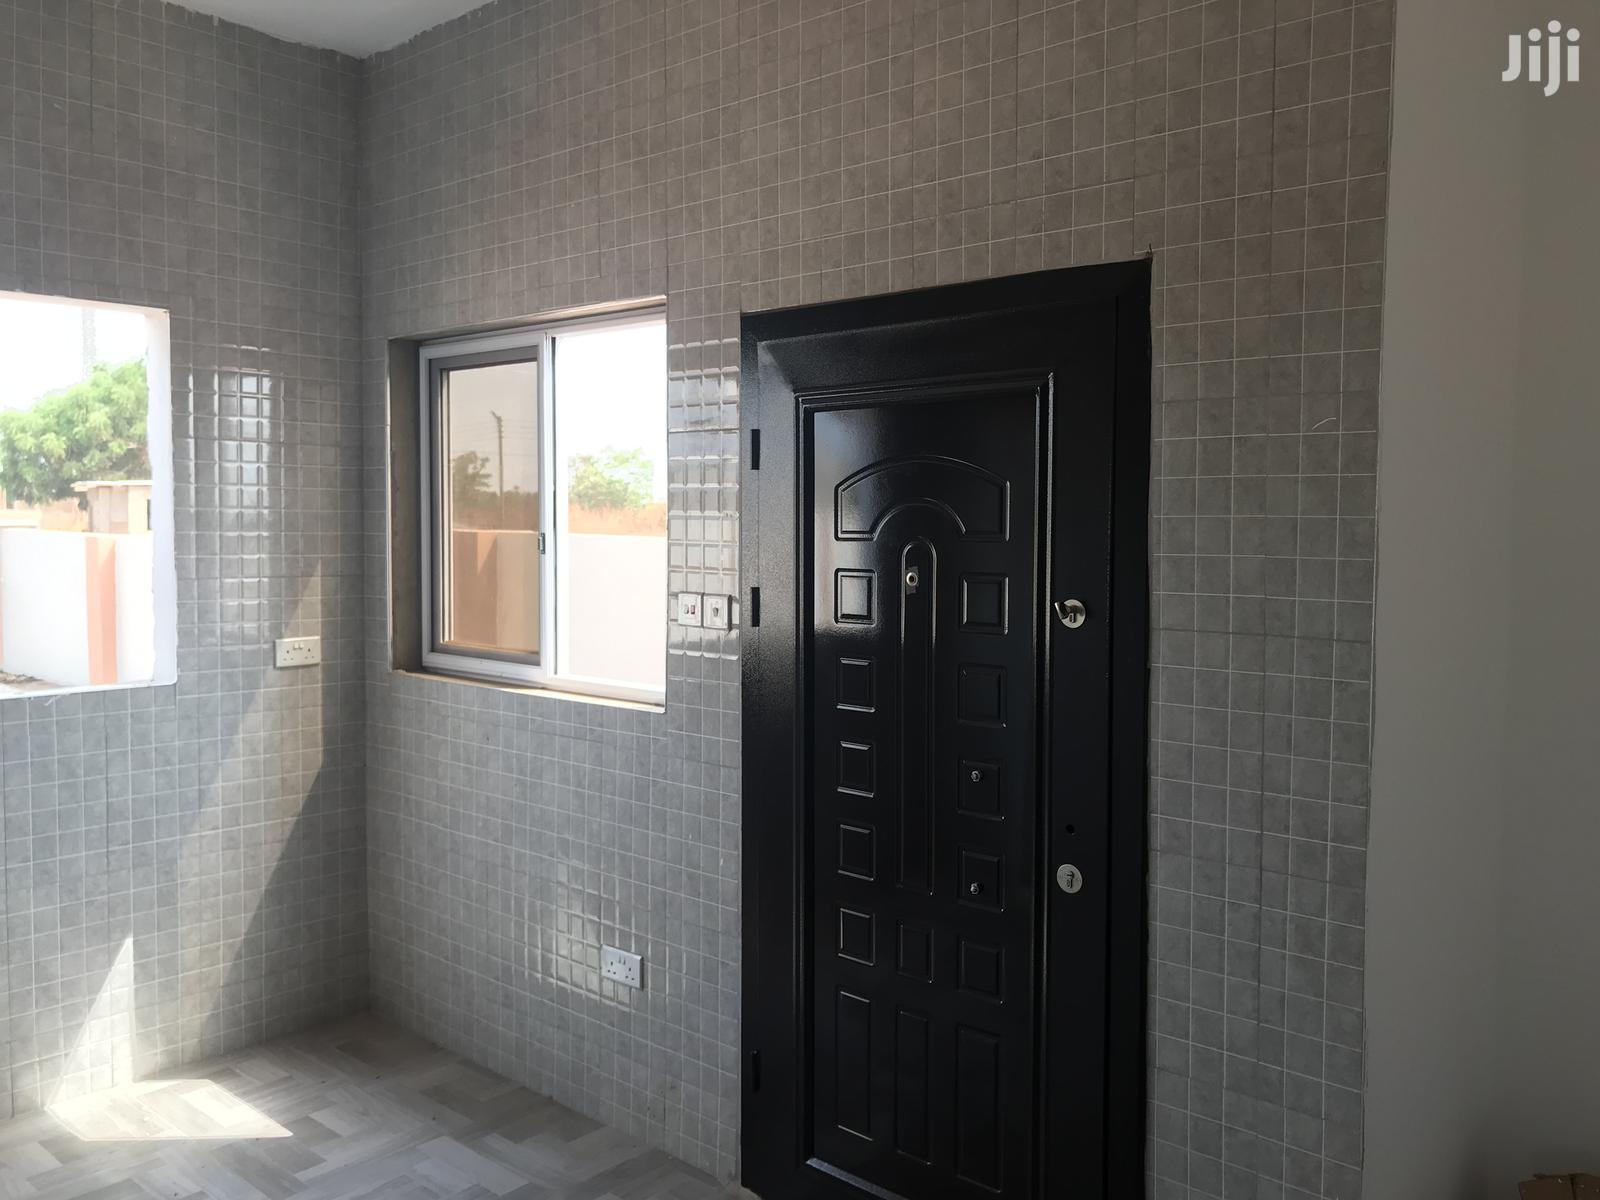 Three Bedroom HSE For Sale @ East Legon Hills   Houses & Apartments For Sale for sale in East Legon, Greater Accra, Ghana